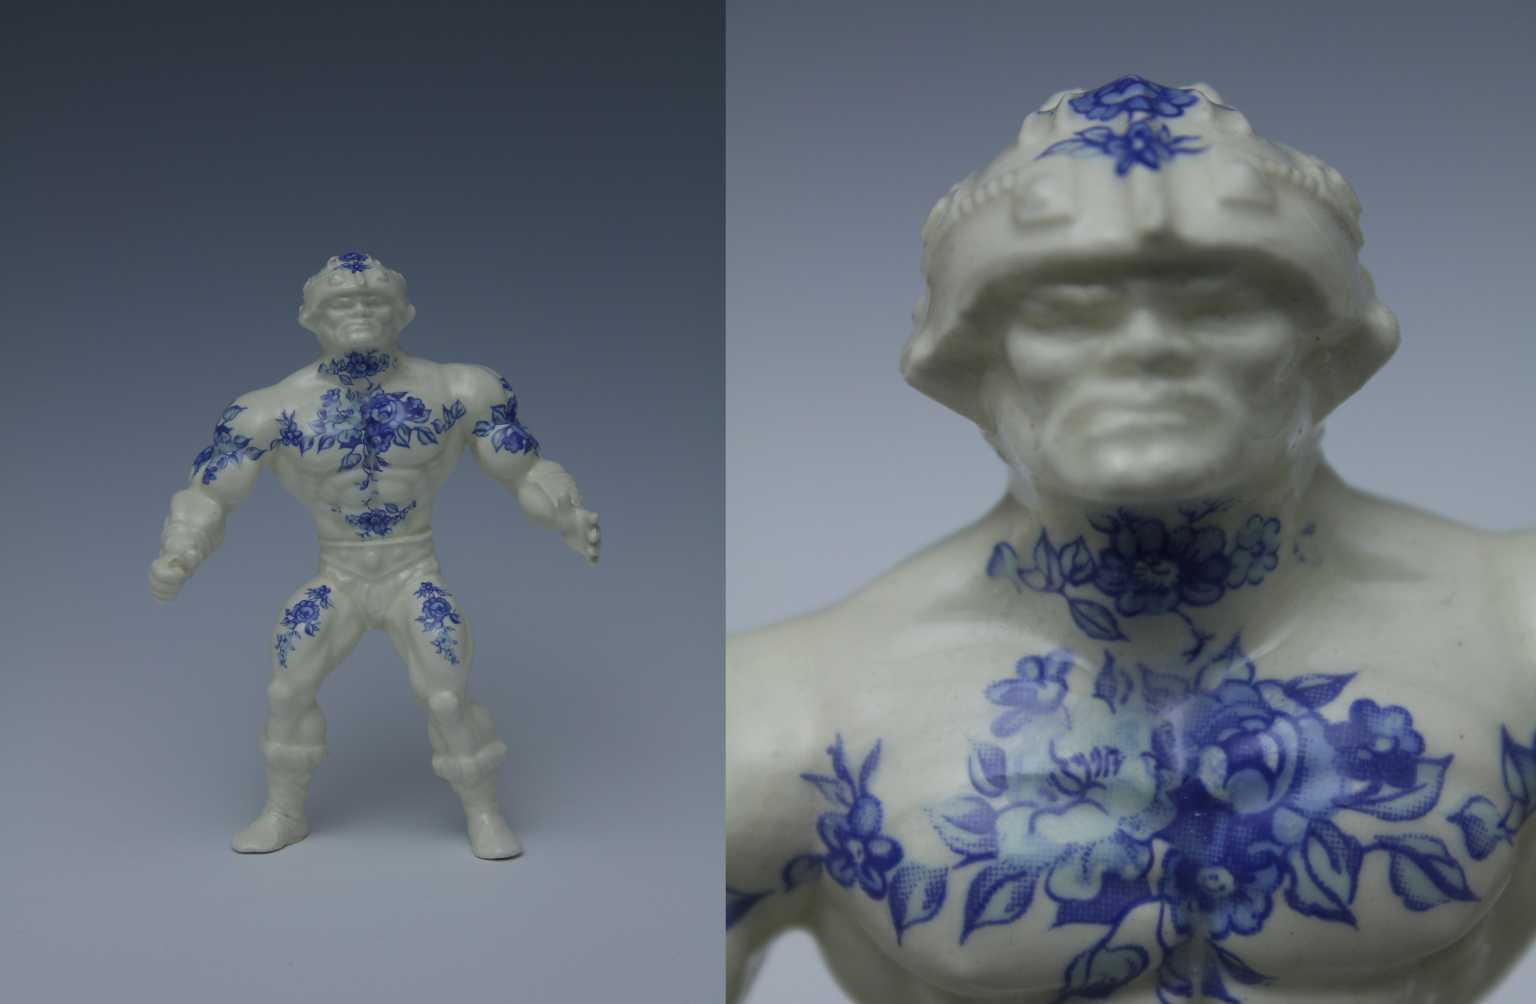 Man-At-Arms (Blue Rose)